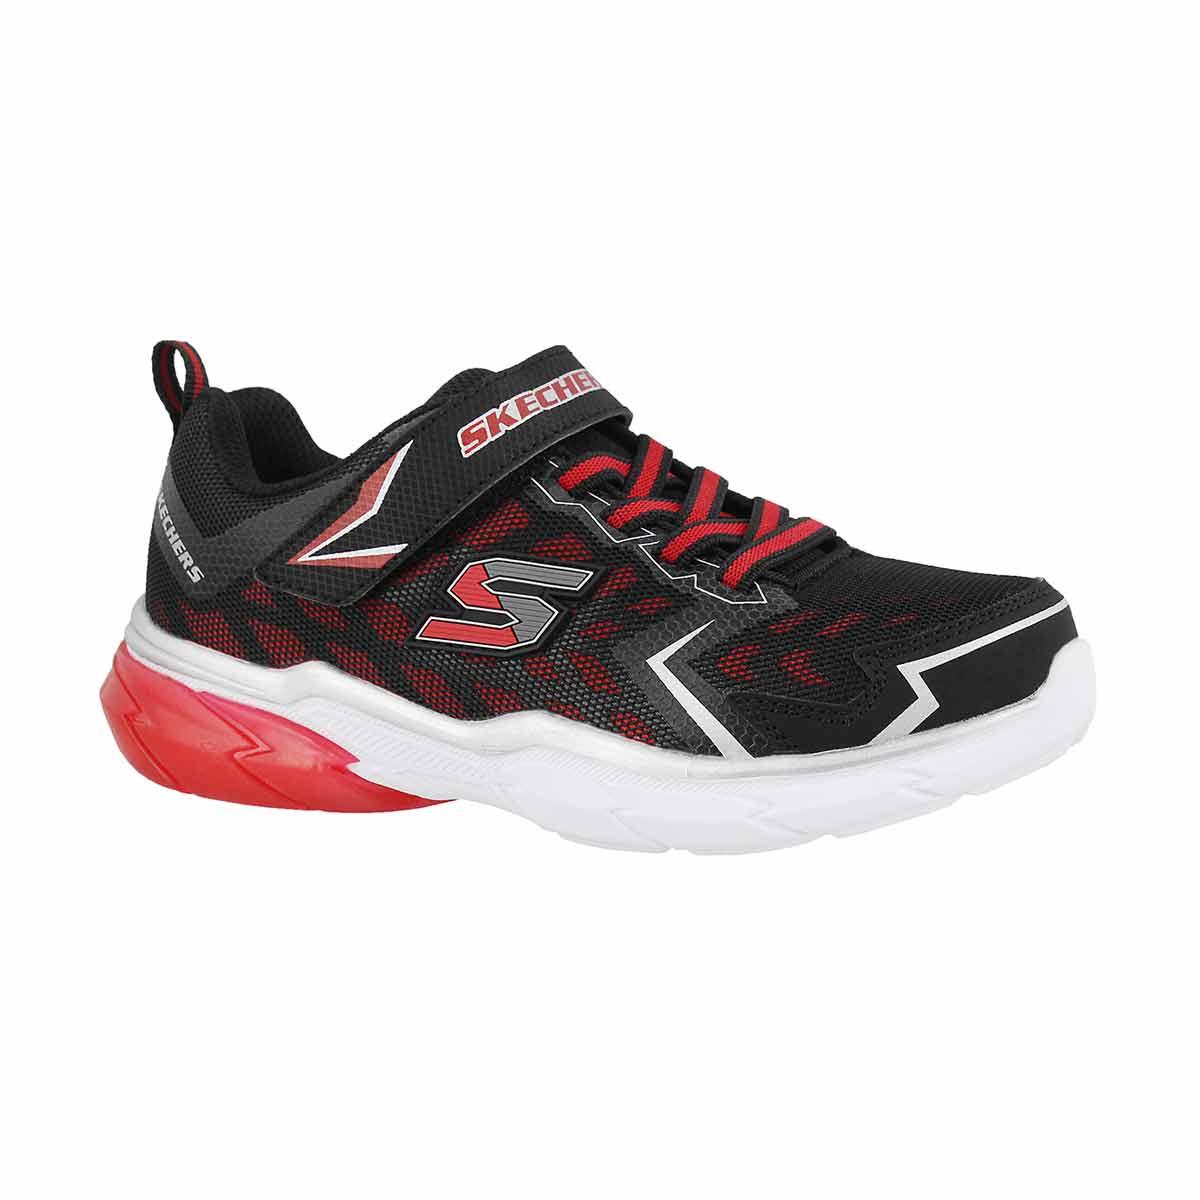 Boys' THERMOFLUX NANO GRID black/red sneakers